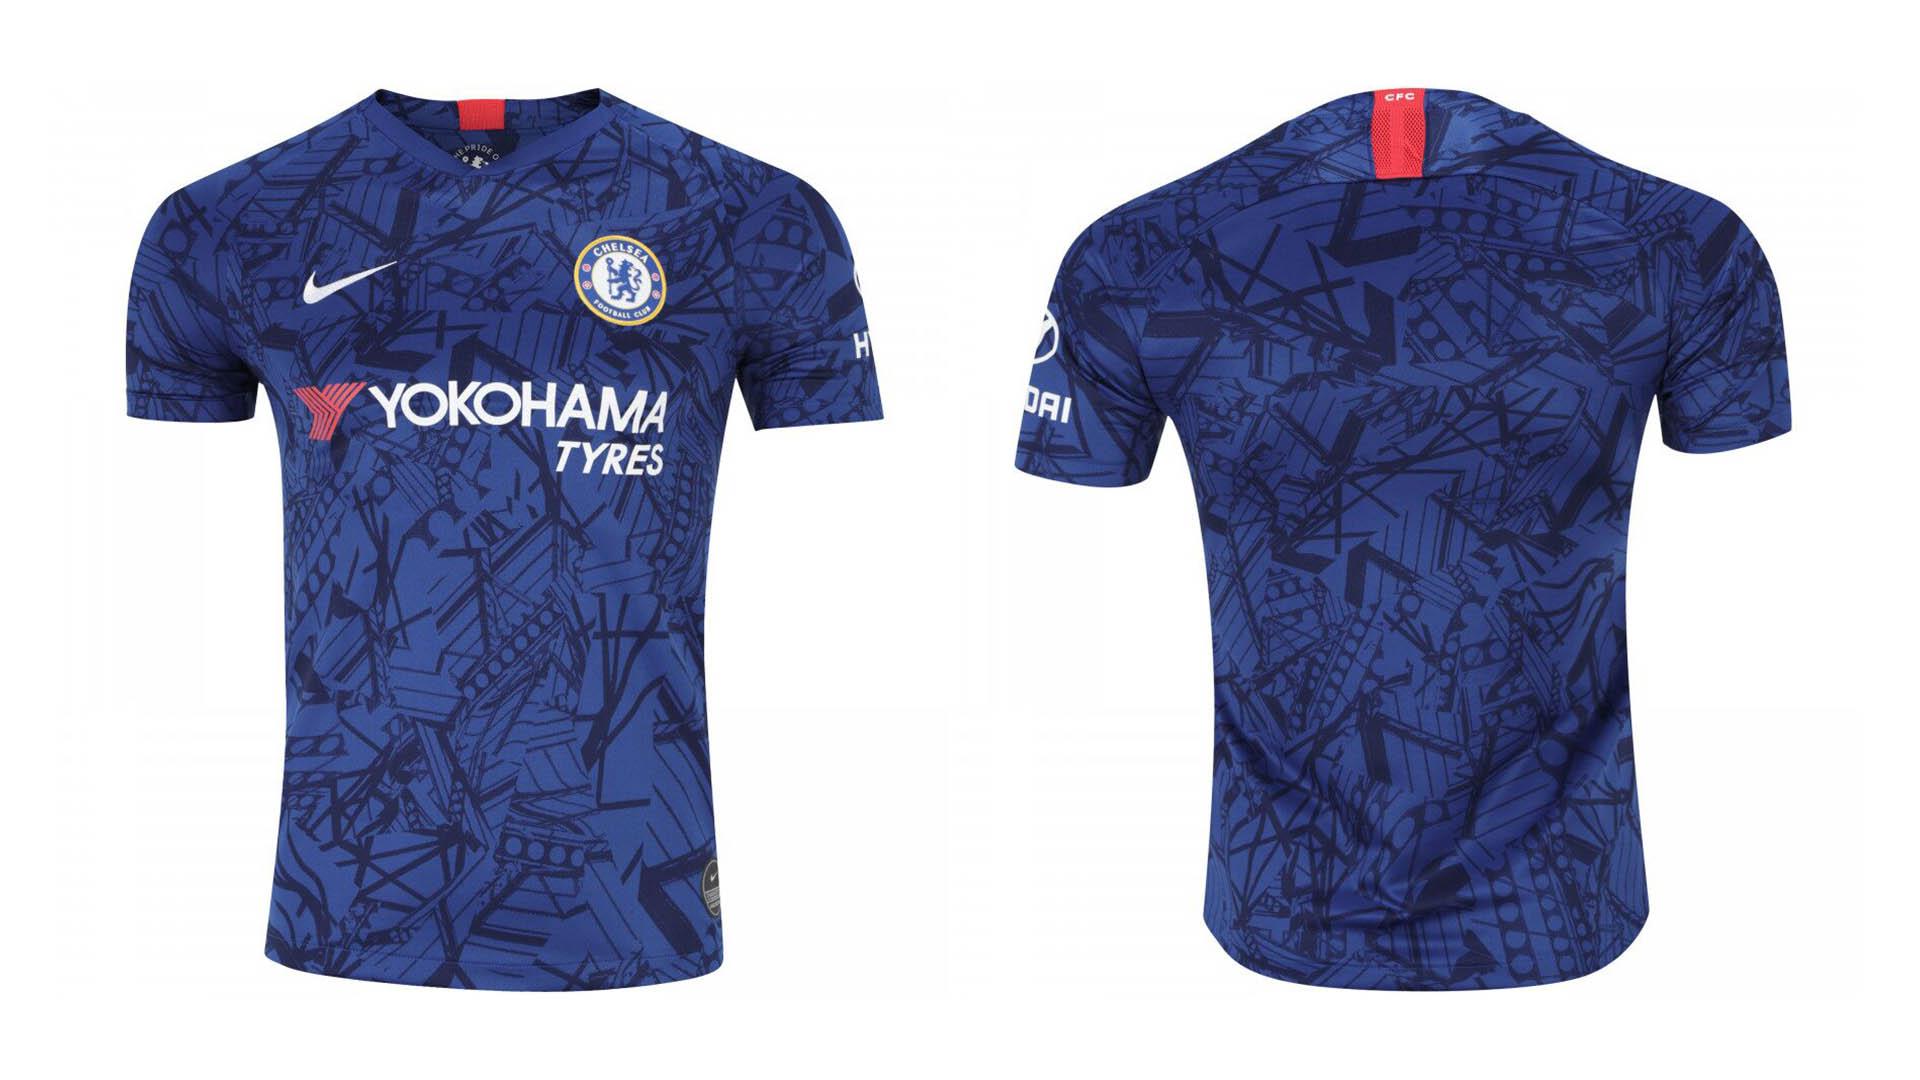 uniforme titular chelsea 2019 20